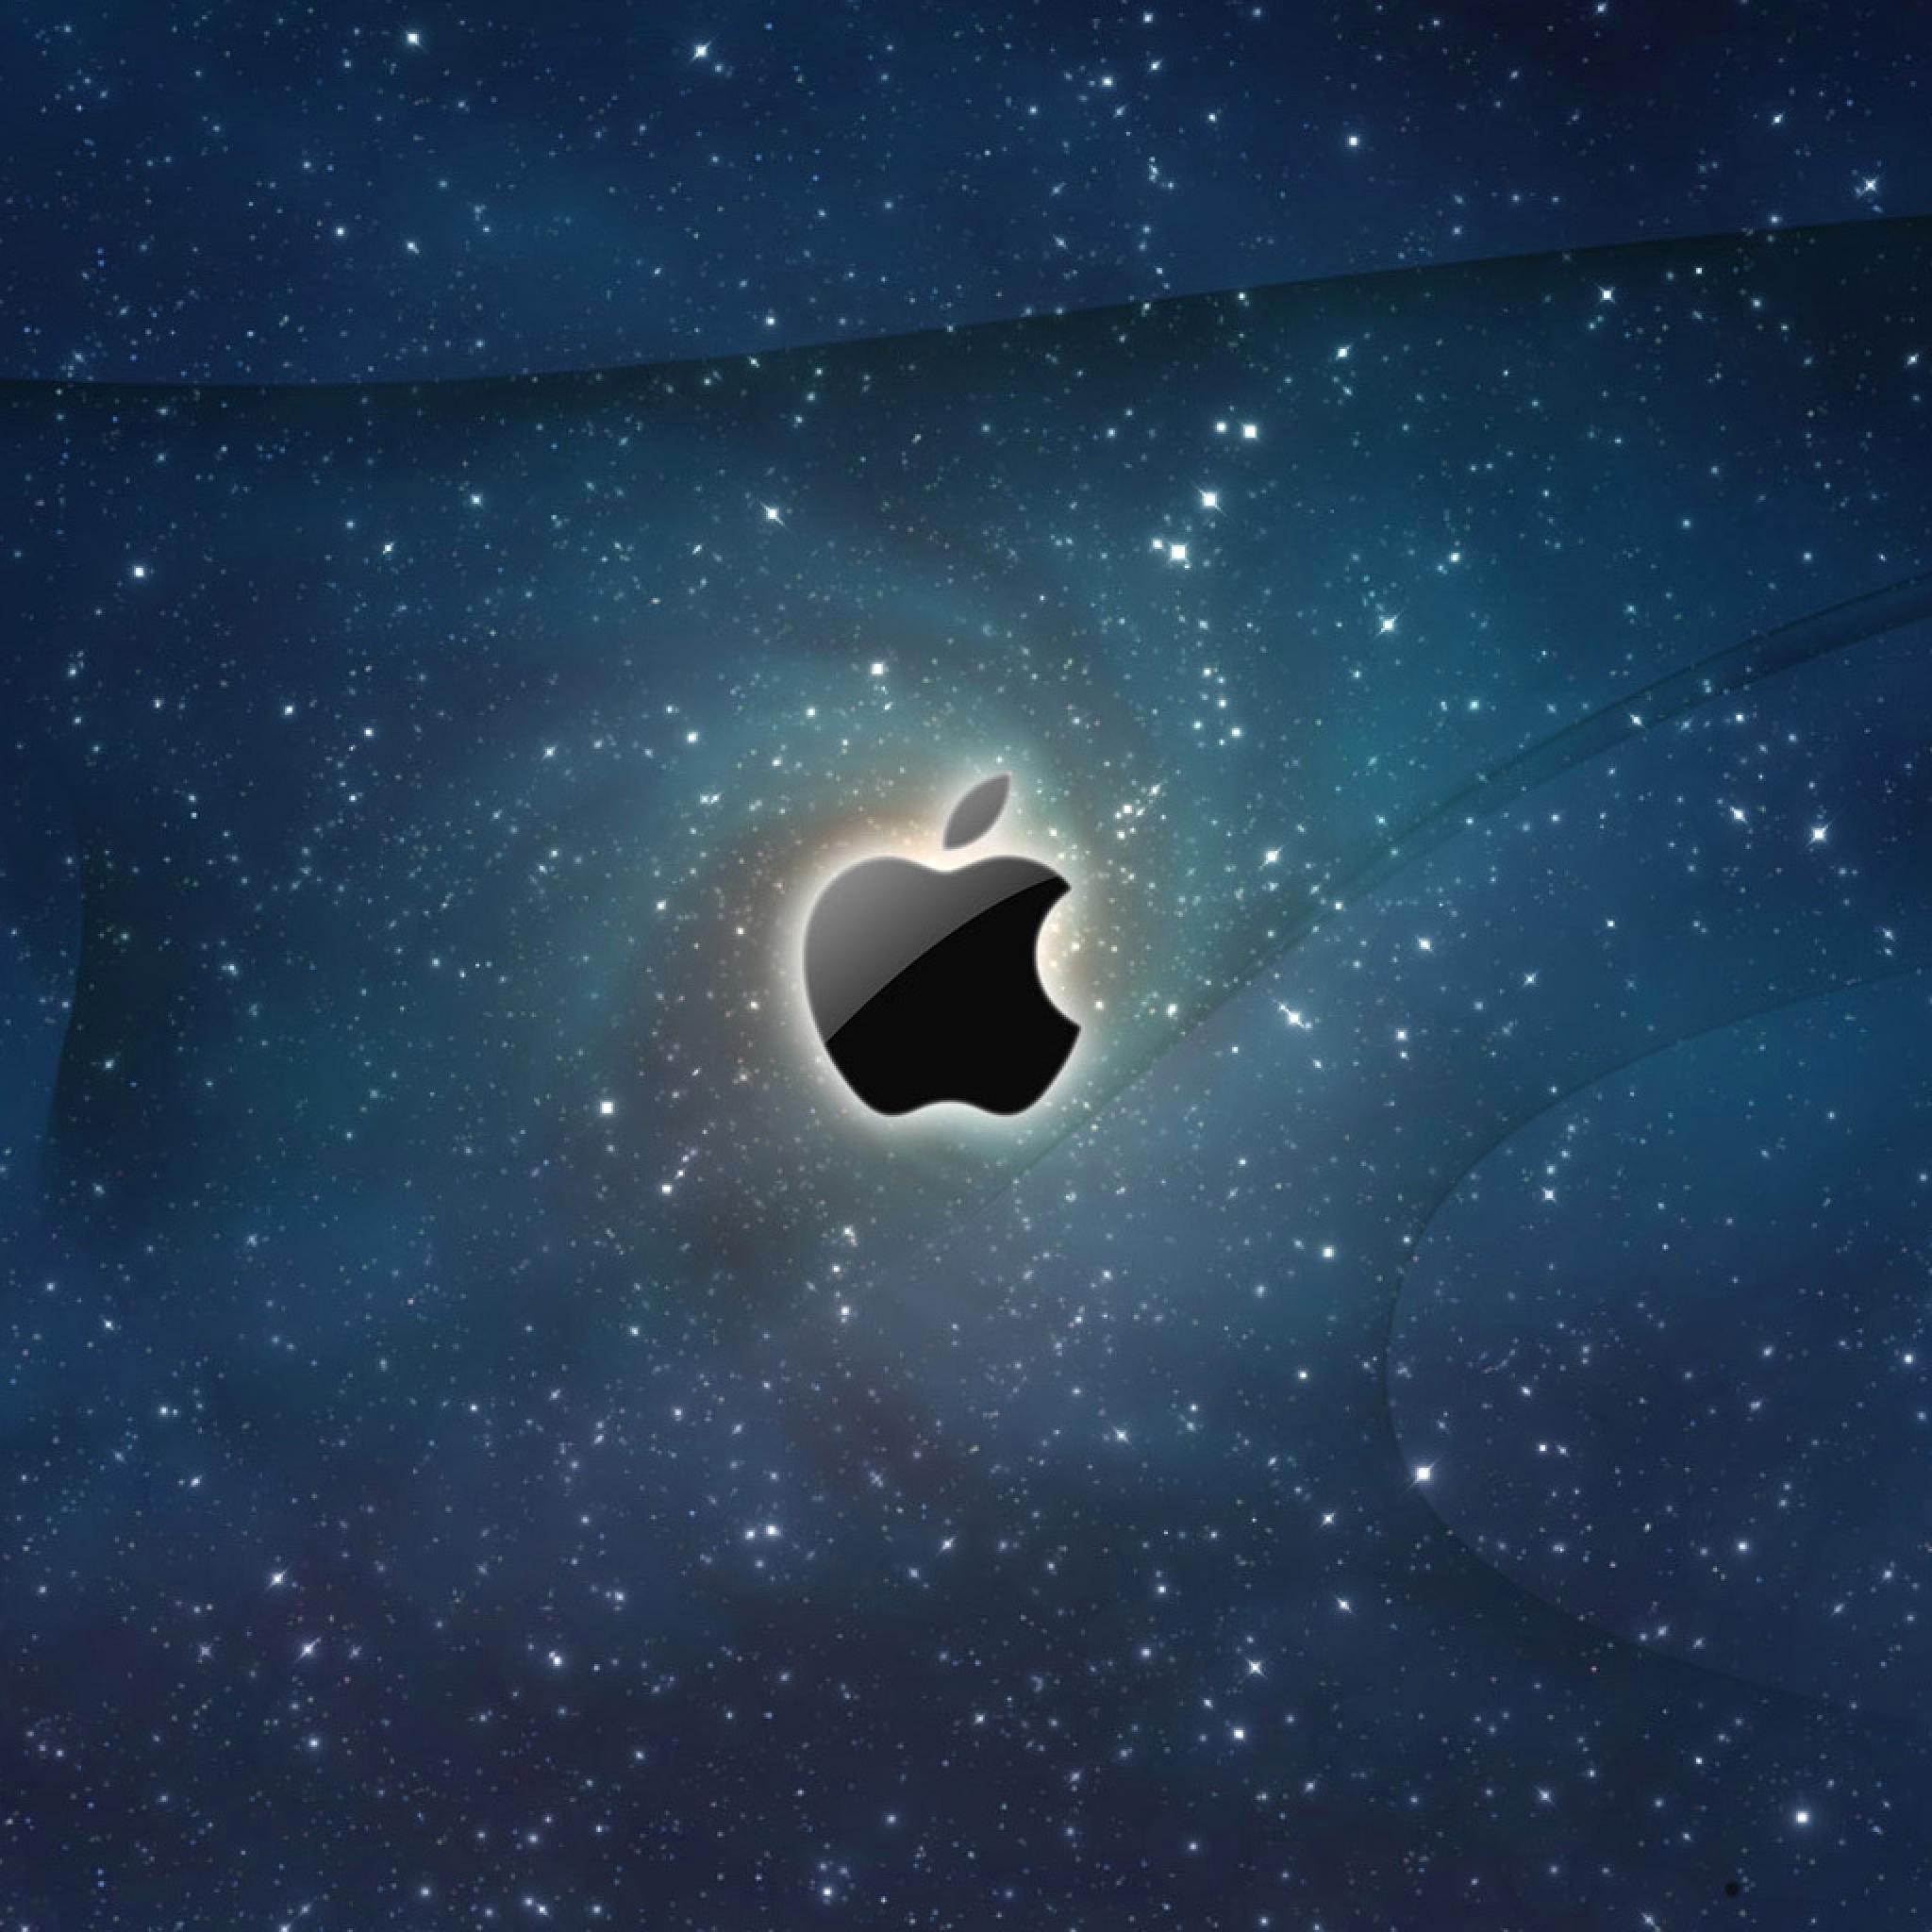 Apple Galaxy 3Wallpapers IPad Retina